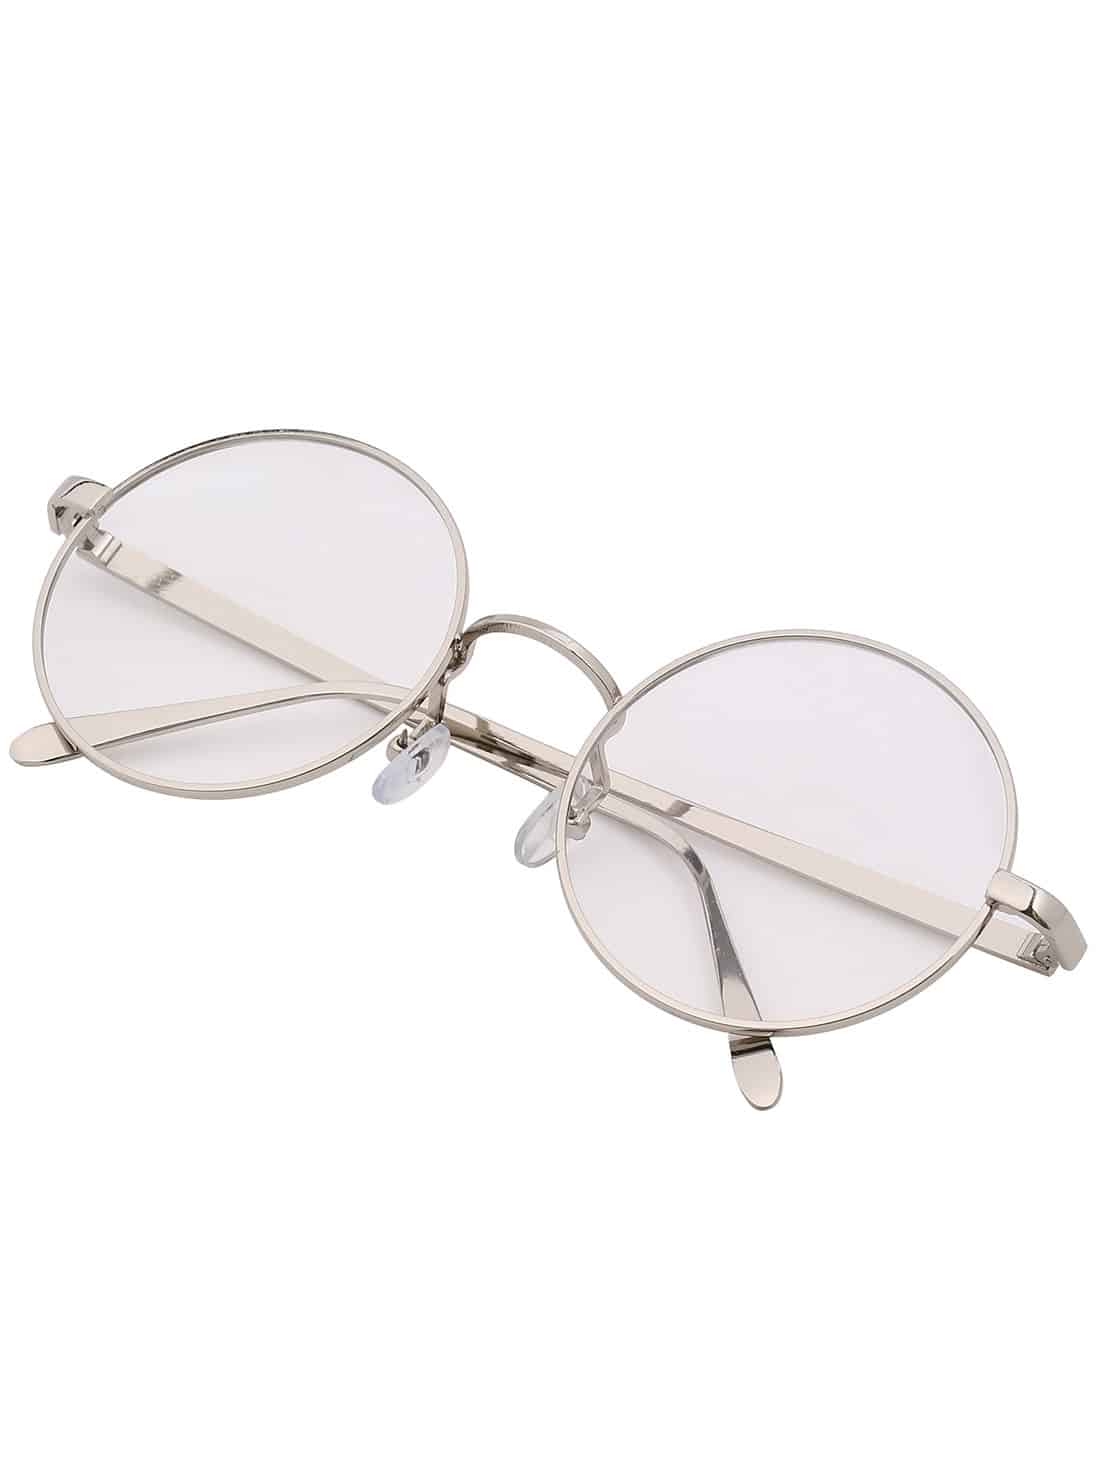 c872c0b19ca1 Silver Frame Retro Round Sunglasses · Silver Lenses ...